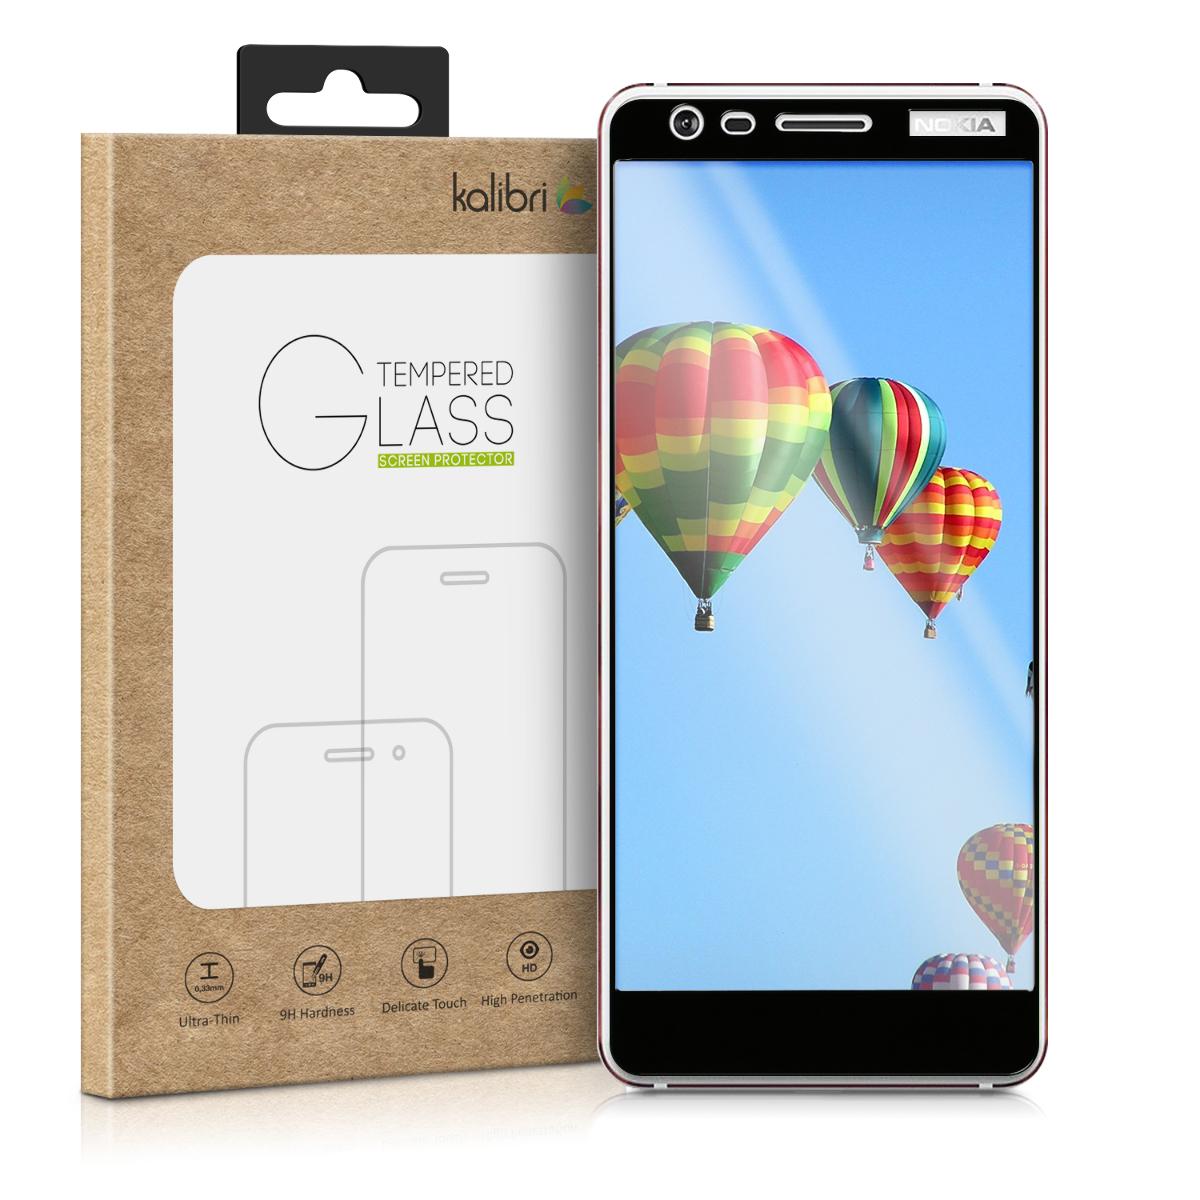 Kalibri Tempered Glass - Fullface Αντιχαρακτικό Γυαλί Οθόνης Nokia 3.1 2018 - Black Frame (45390.01)